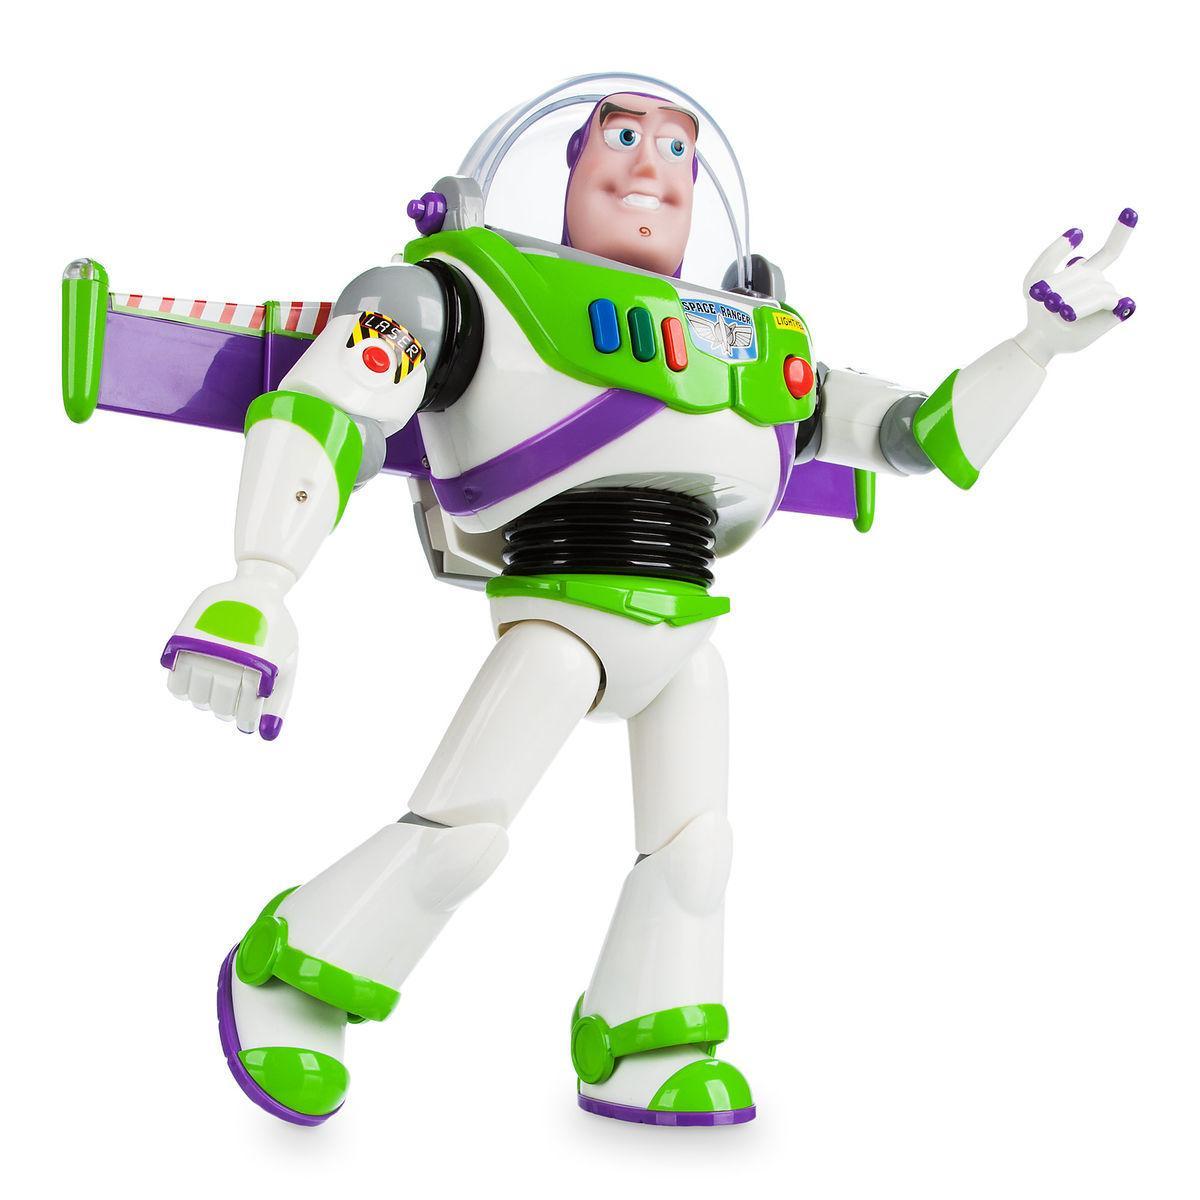 buzz-lightyear-toy-1542042719030-1542042721467.jpeg